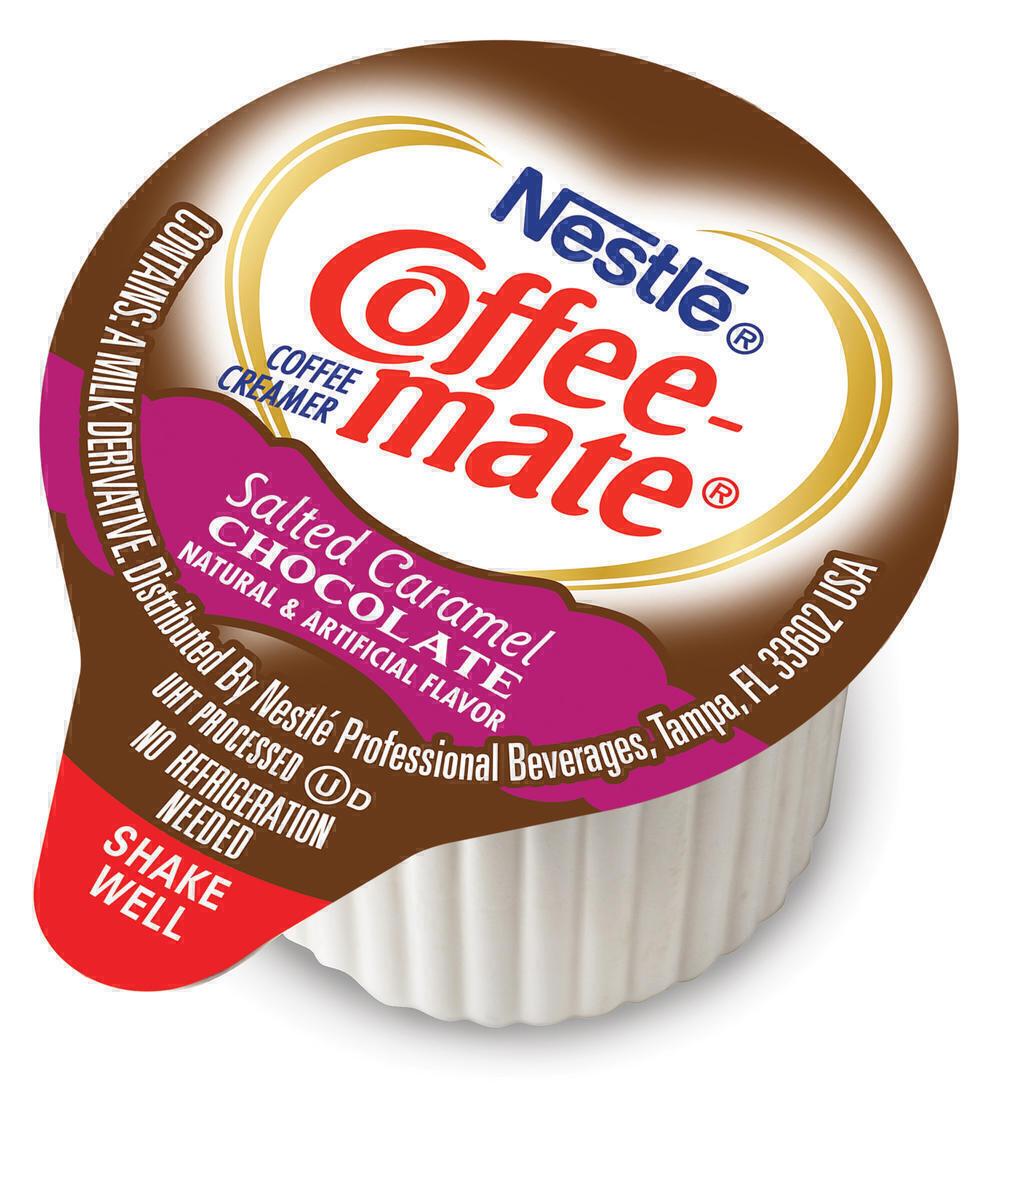 Coffee-Mate Salted Caramel Chocolate